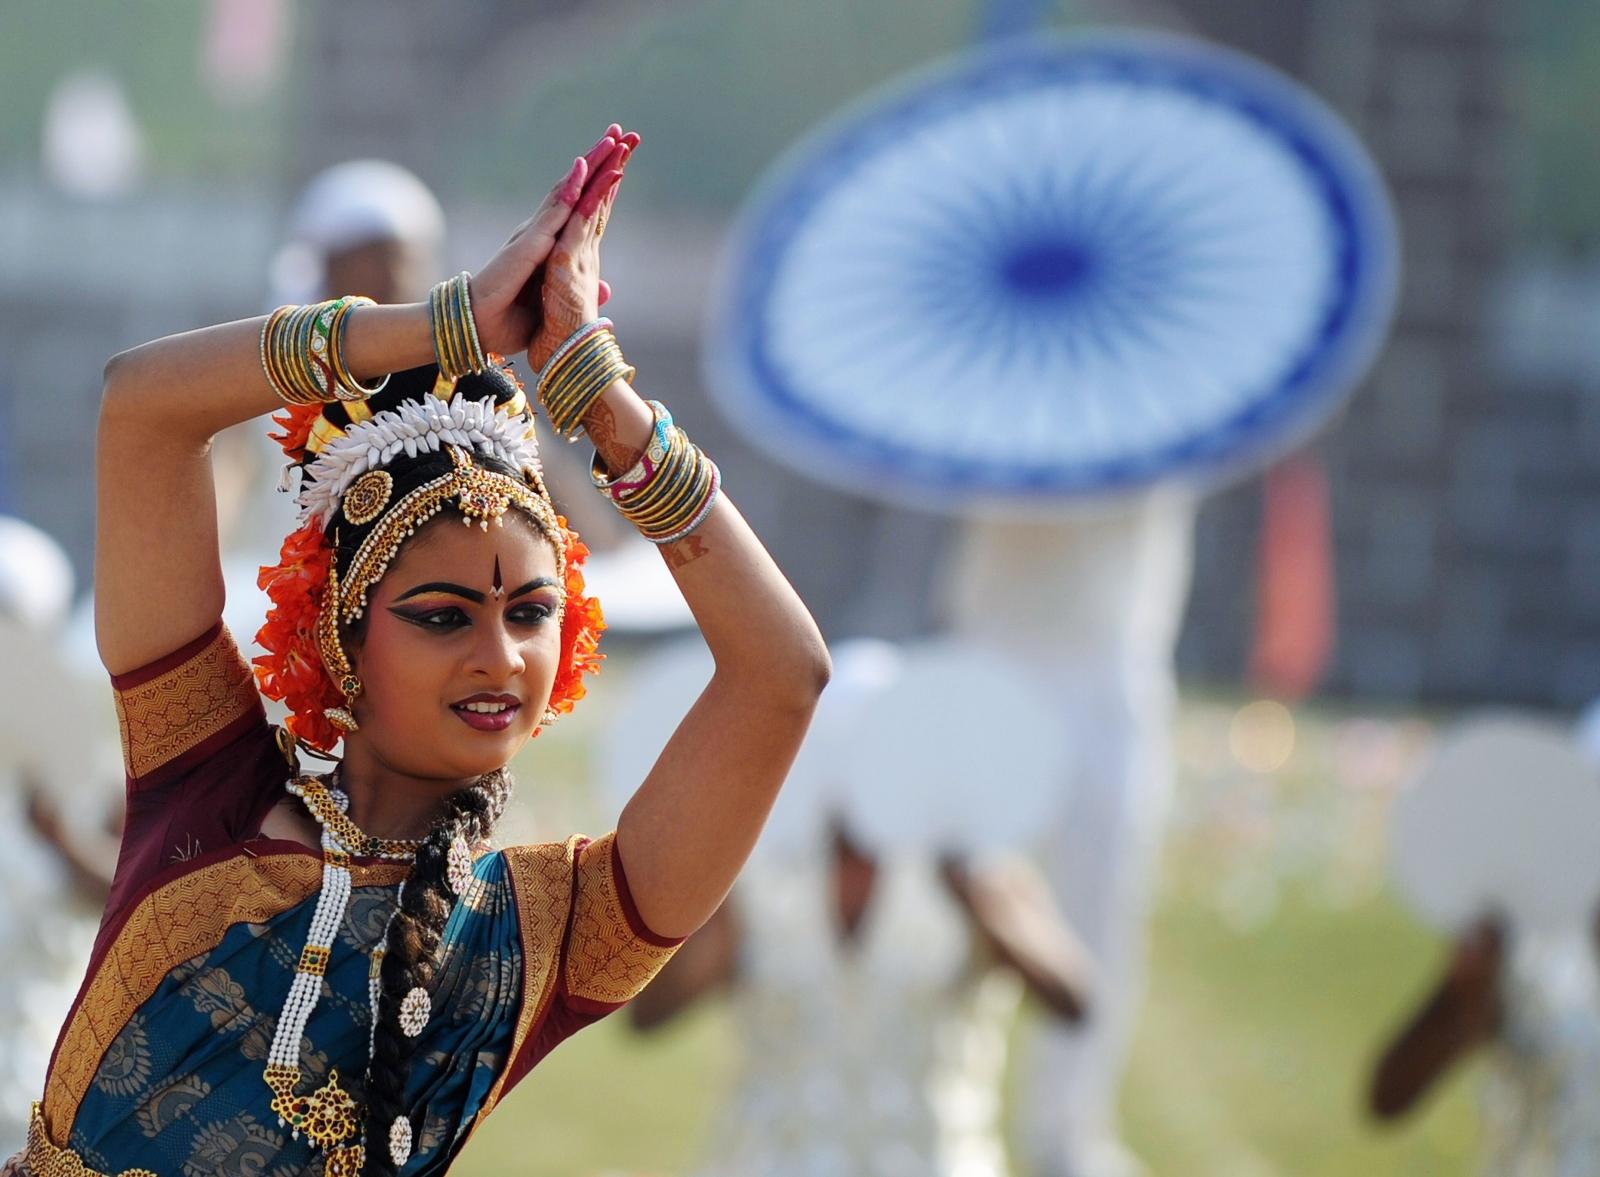 India Celebrations And Holidays India's National Holiday